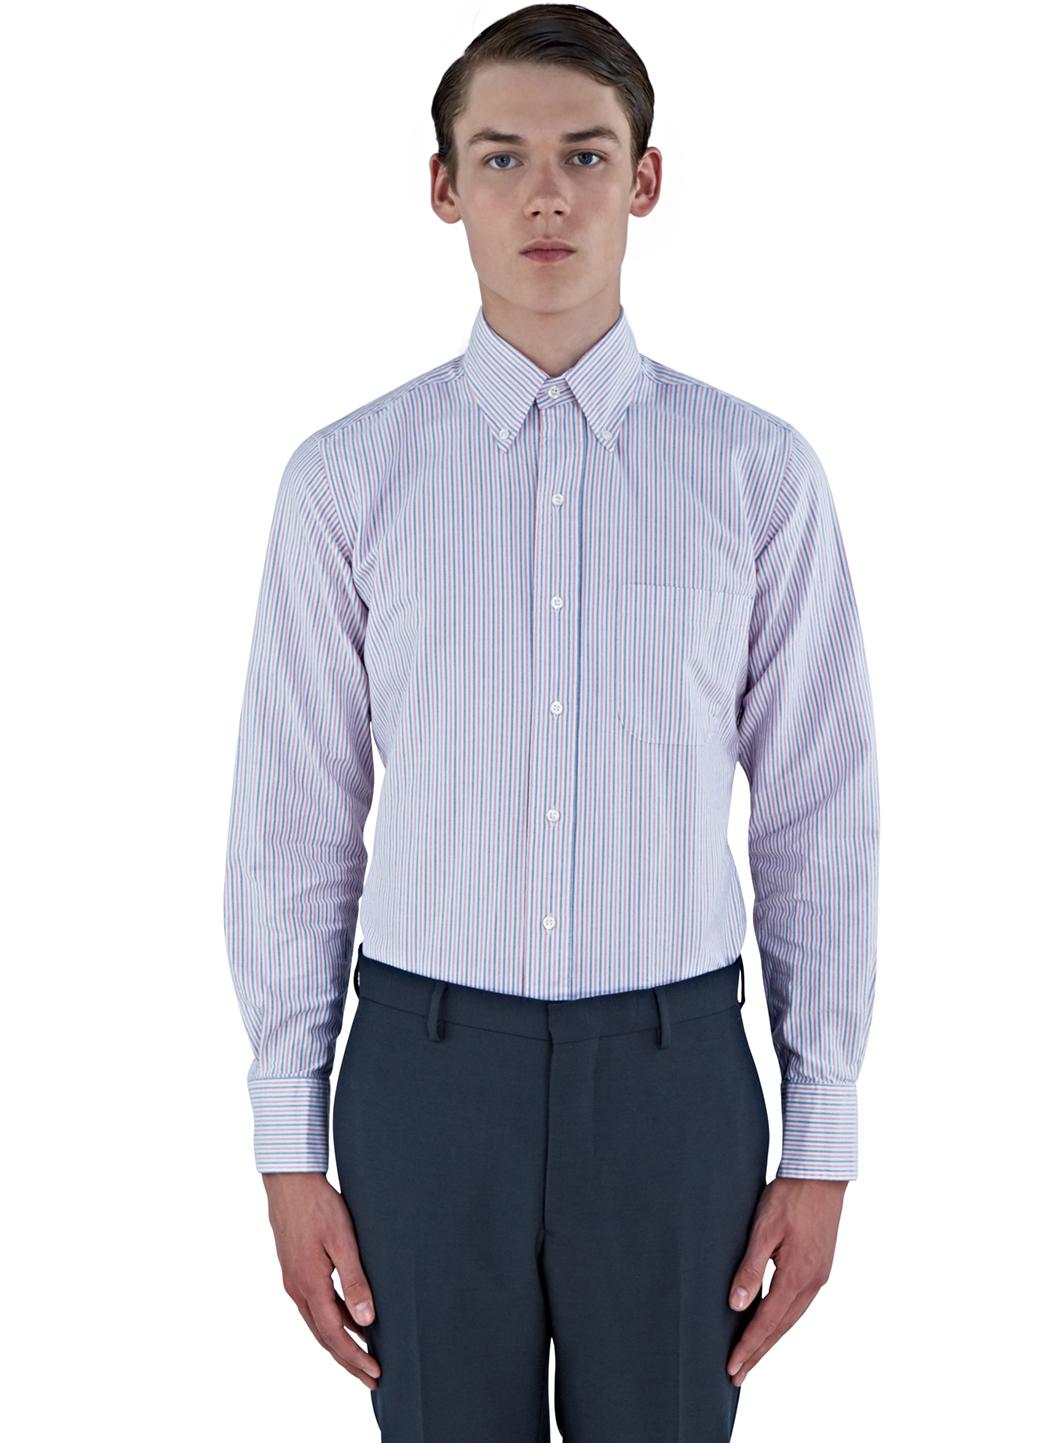 Thom browne men 39 s classic university striped oxford shirt for White oxford shirt mens